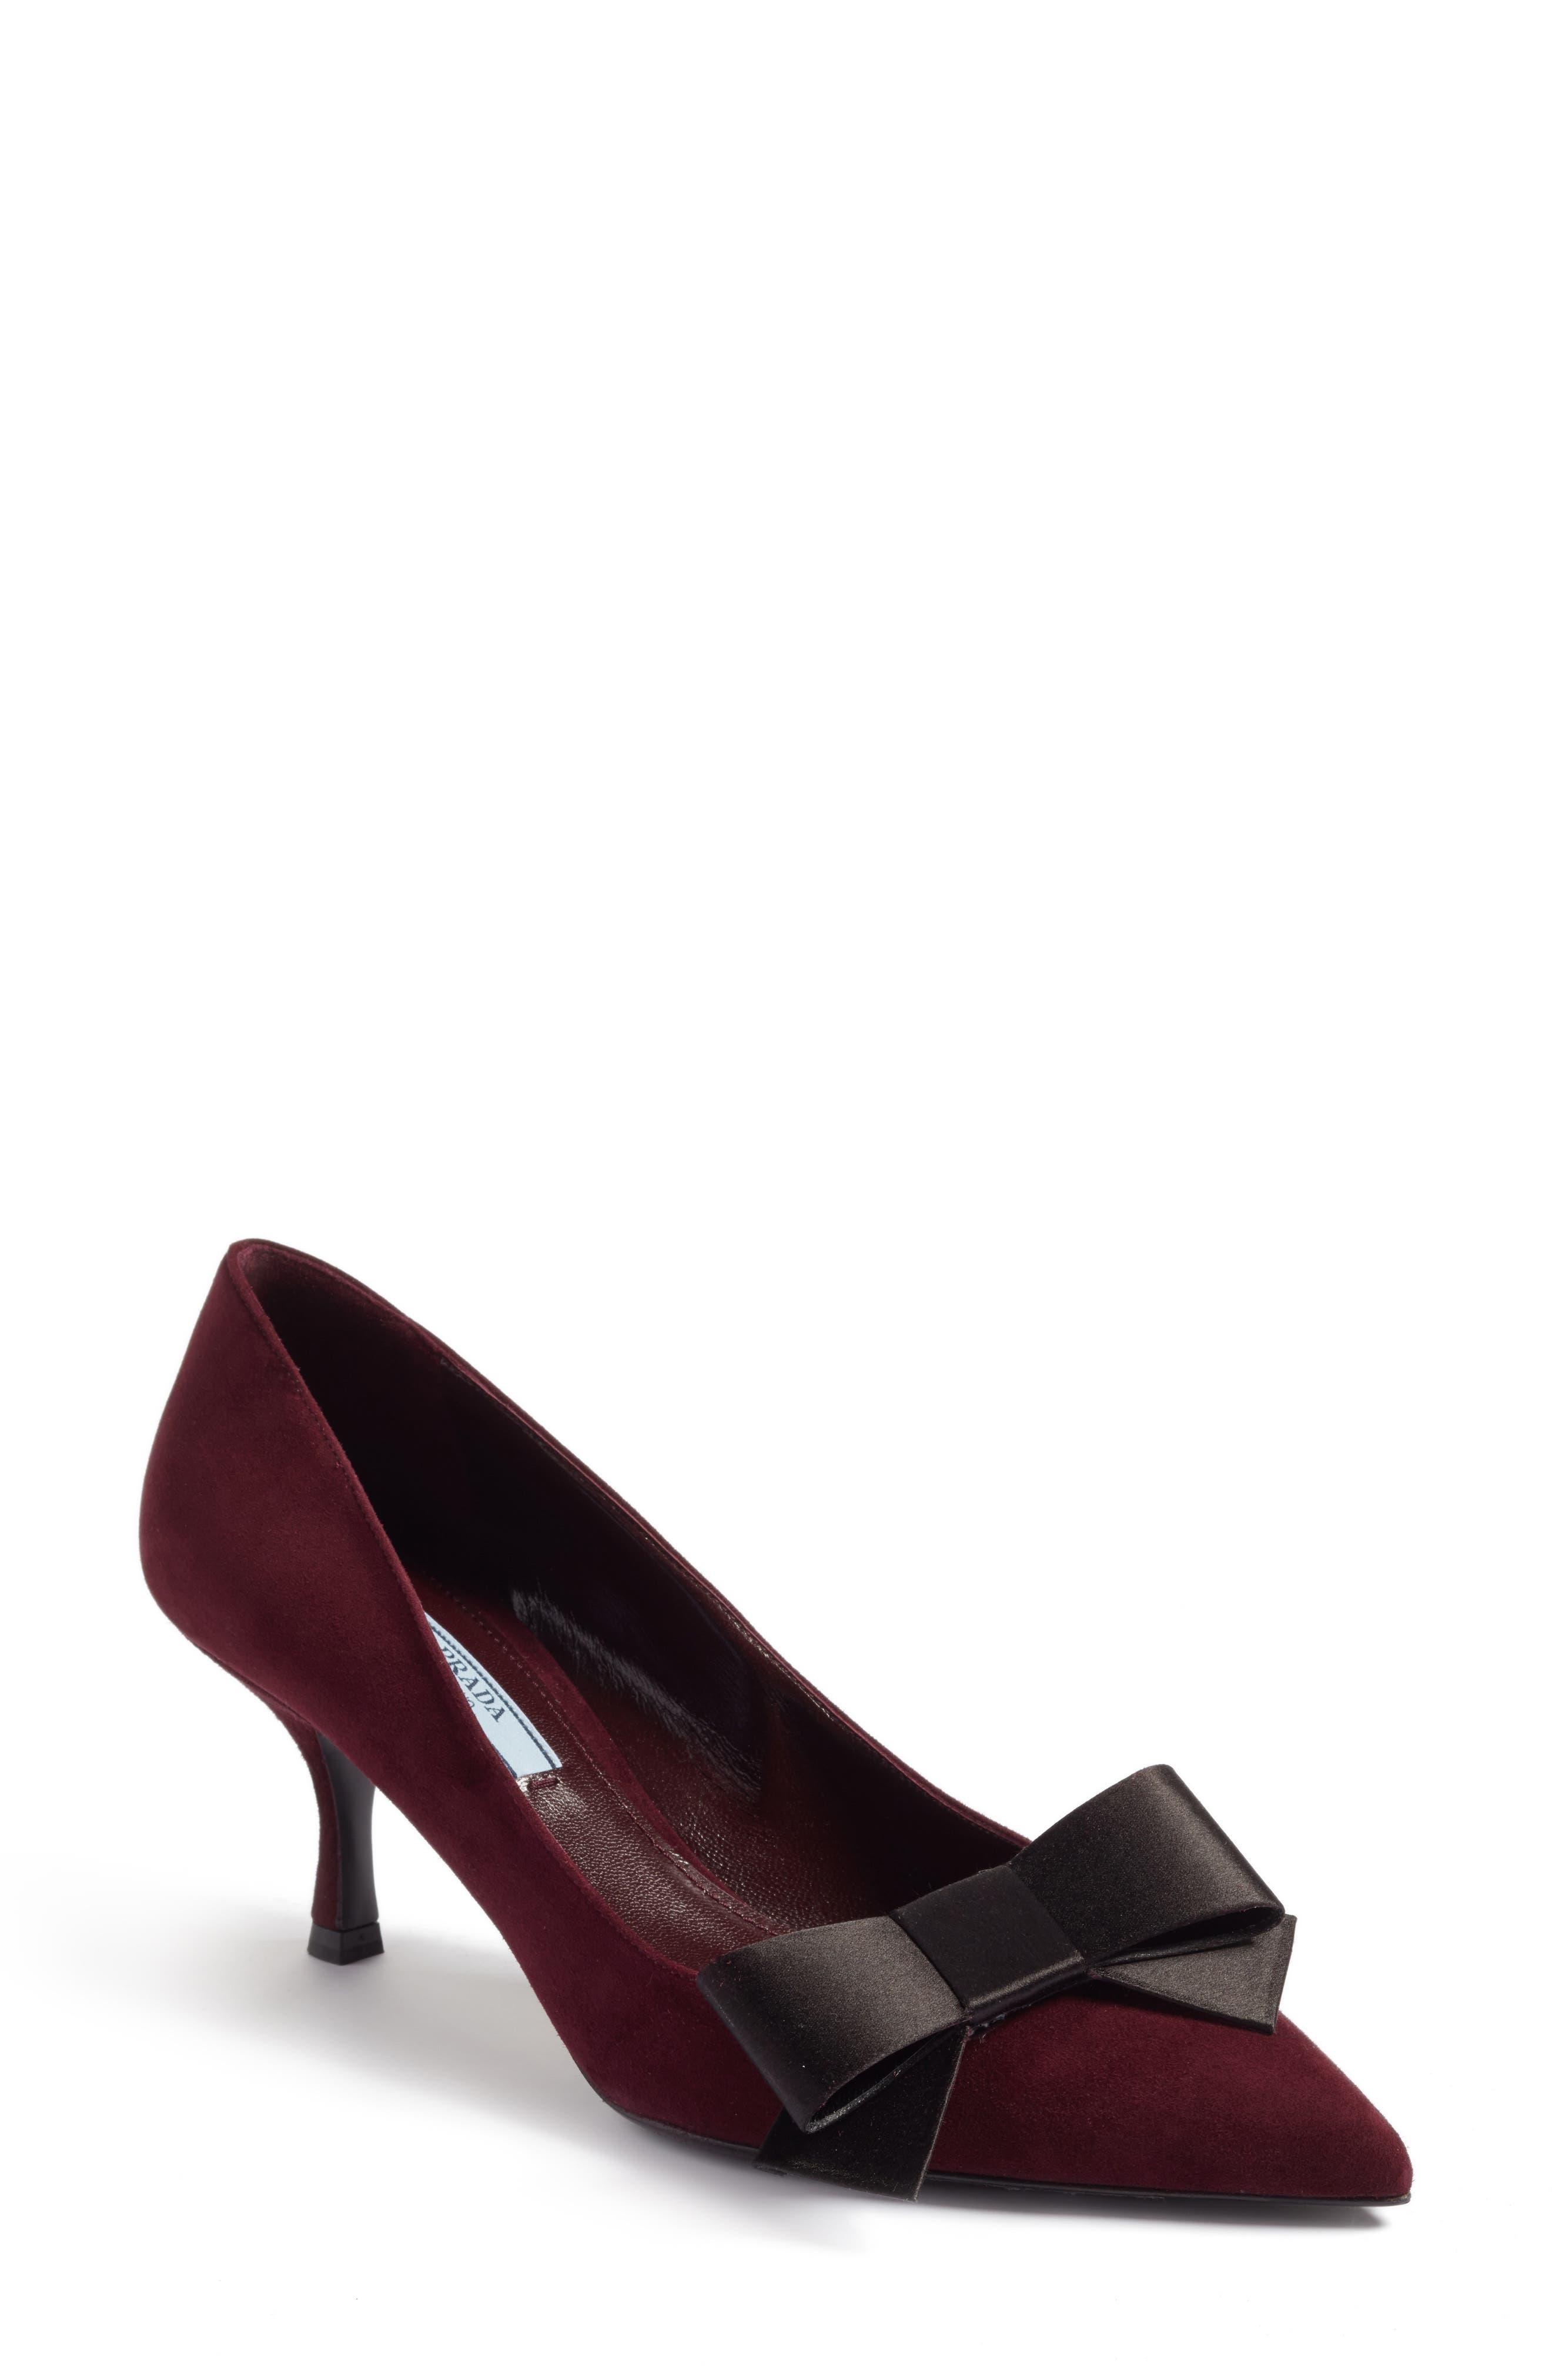 Alternate Image 1 Selected - Prada Bow Pointy Toe Pump (Women)